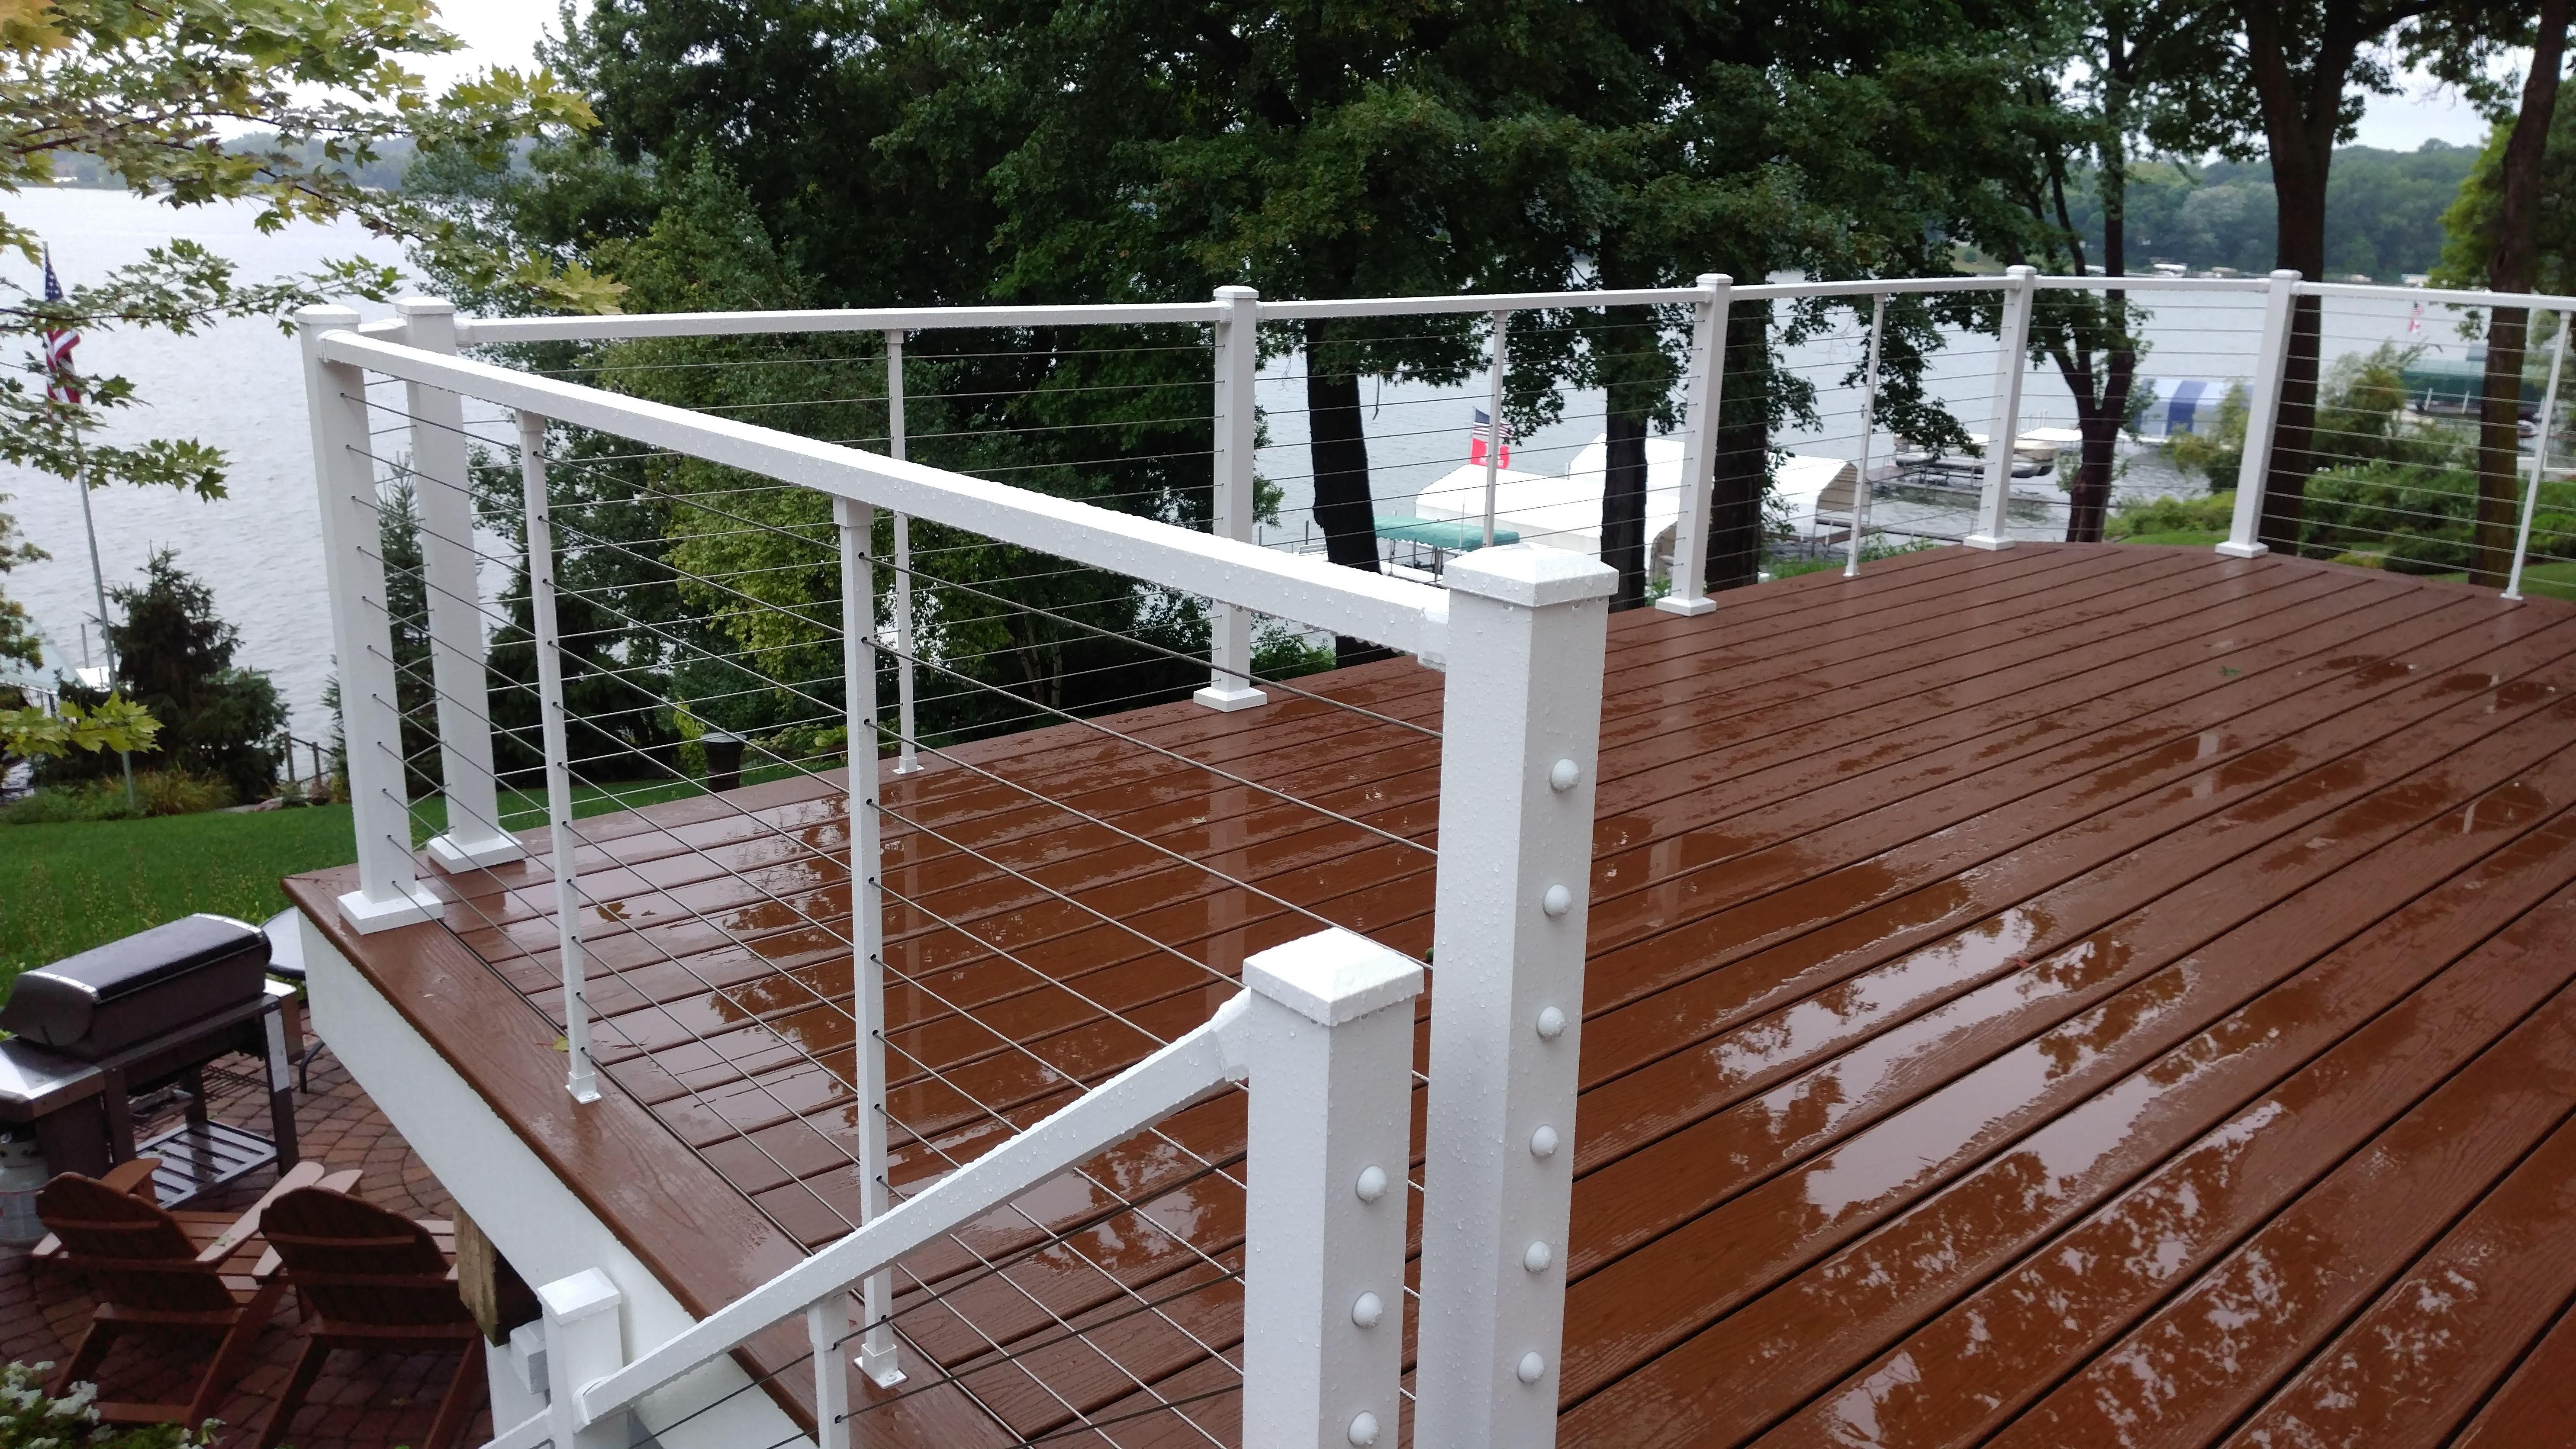 Skyline Cable Deck Railing System Building A Deck Deck Design Diy Deck